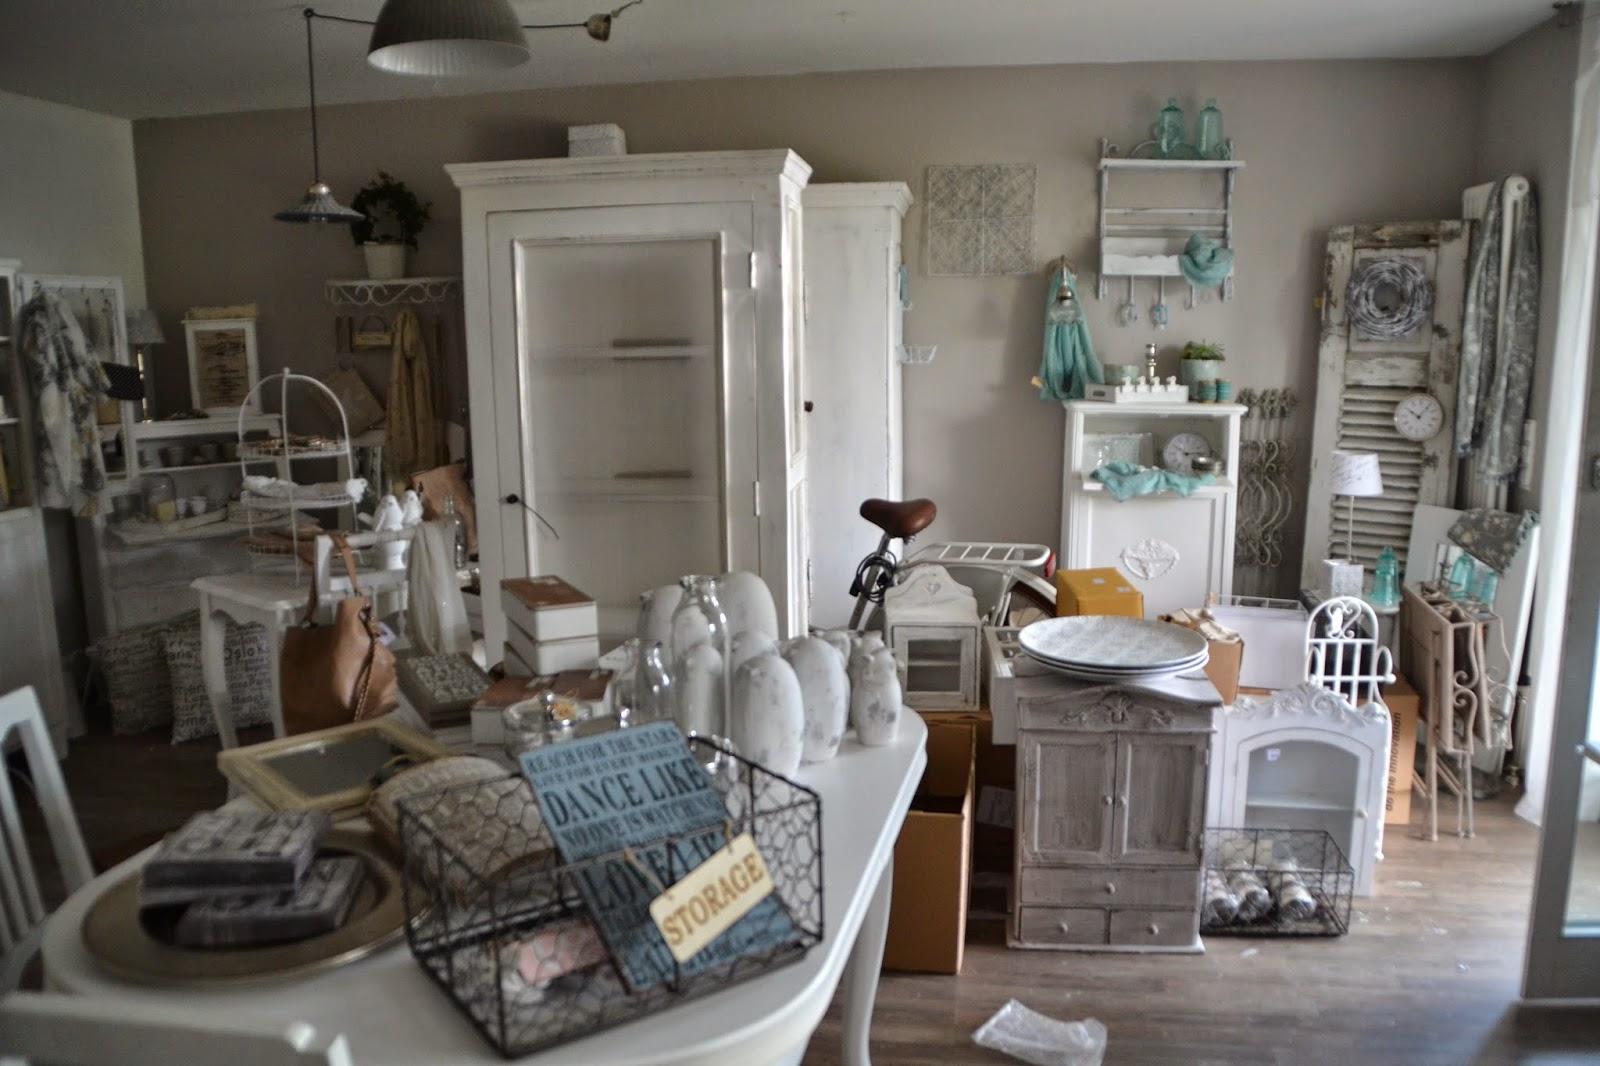 frau k shabby chic aus holland zur ck. Black Bedroom Furniture Sets. Home Design Ideas